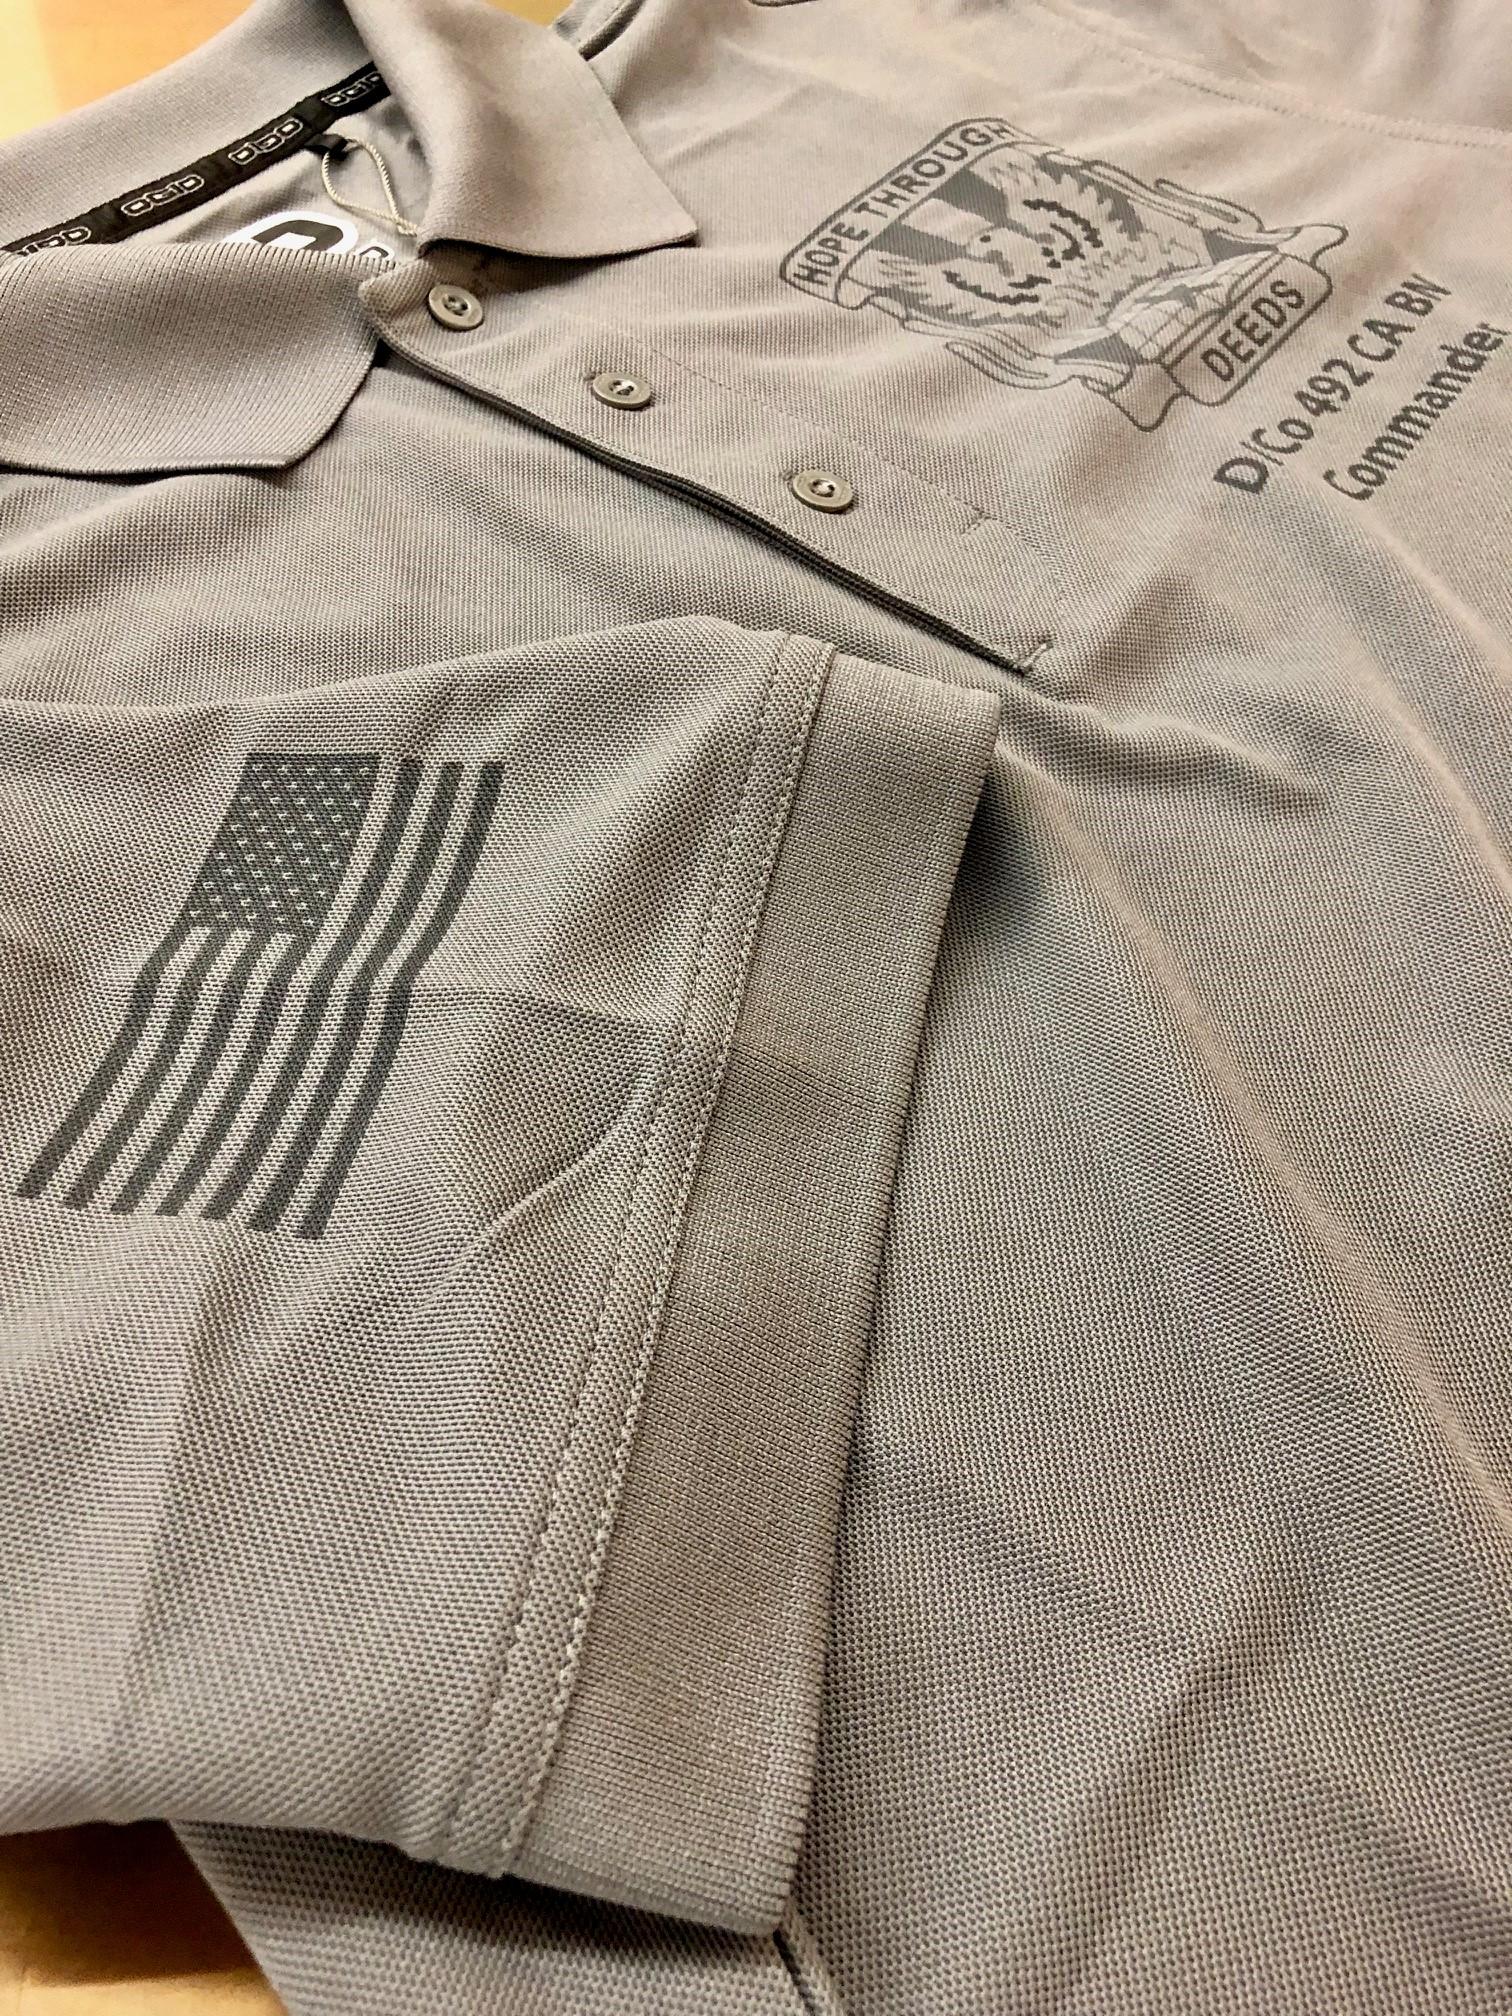 logounltd_laser_etching_embroidery_screen_printing_apparel_uniform_custom_tshirts_dye_sublimation_kirkland_bellevue_seattle_redmond_branded_merchandise_promotional_products_logo_unltd_us_airborn_commander (1).jpg